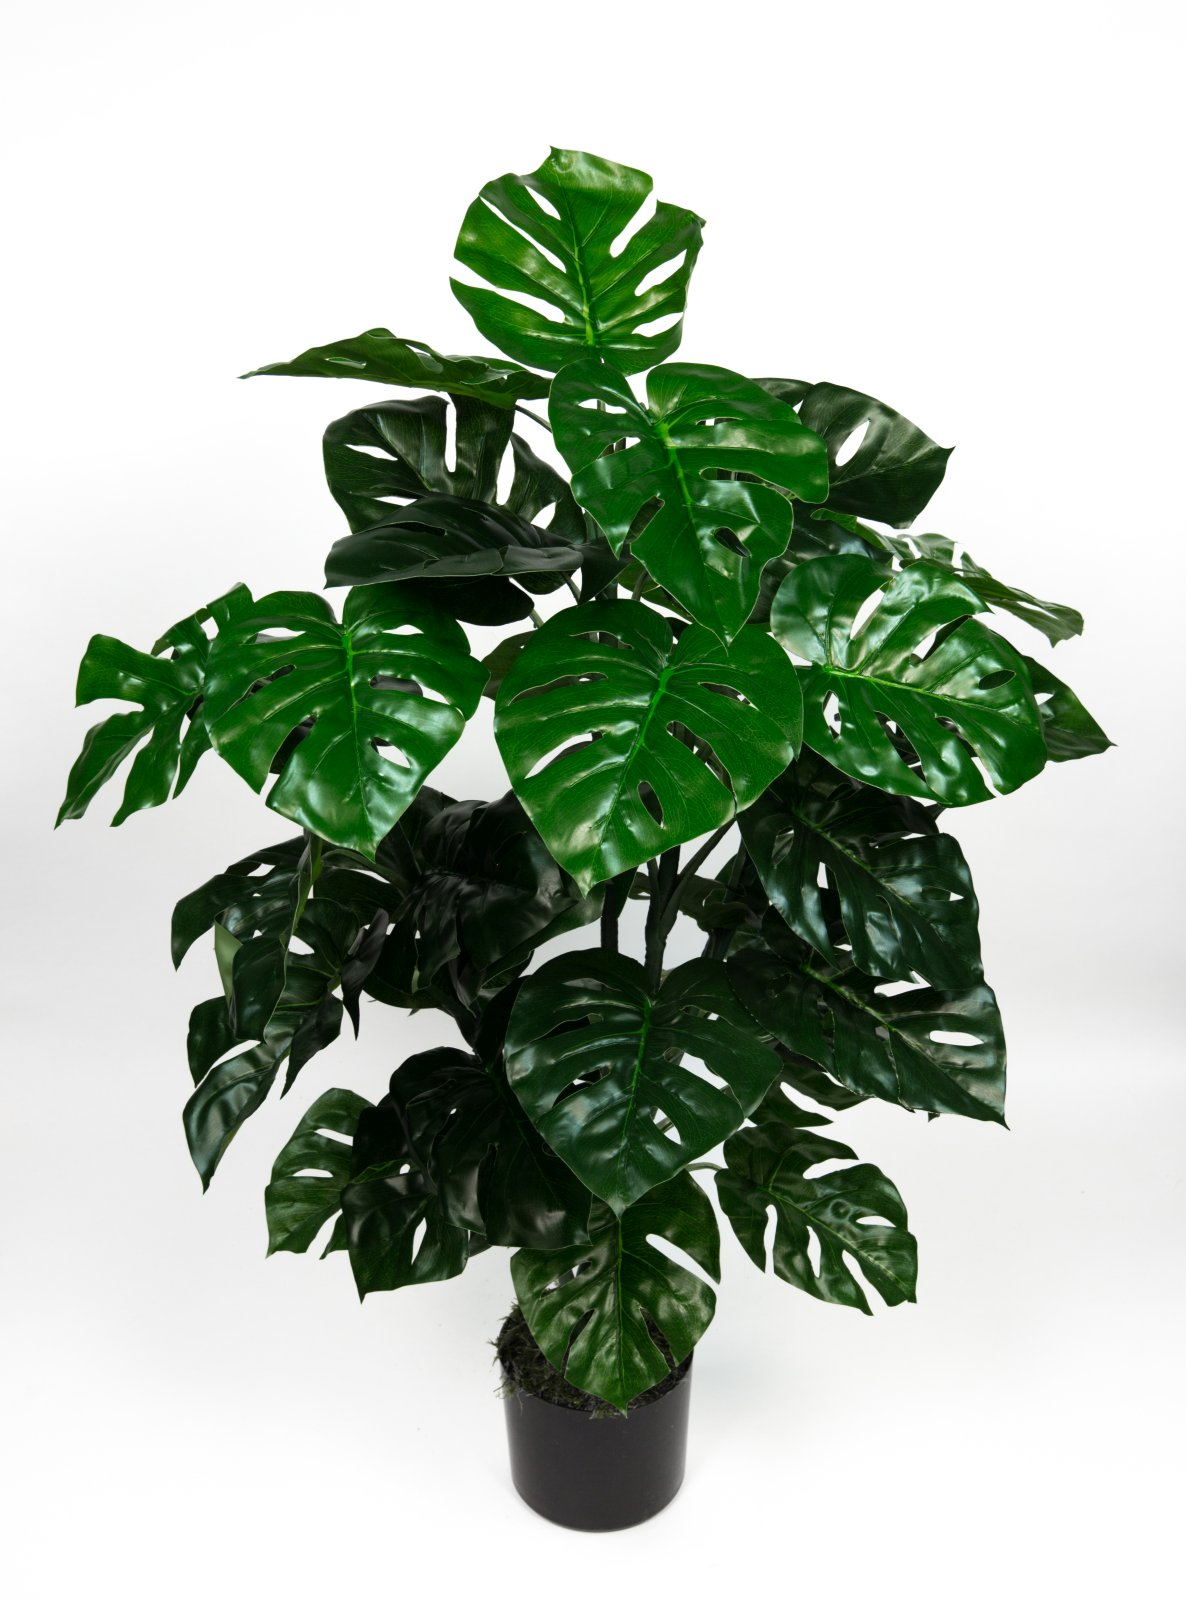 splitphilopflanze real touch 100cm gr n zj kunstpflanzen k nstlicher splitphilo ebay. Black Bedroom Furniture Sets. Home Design Ideas